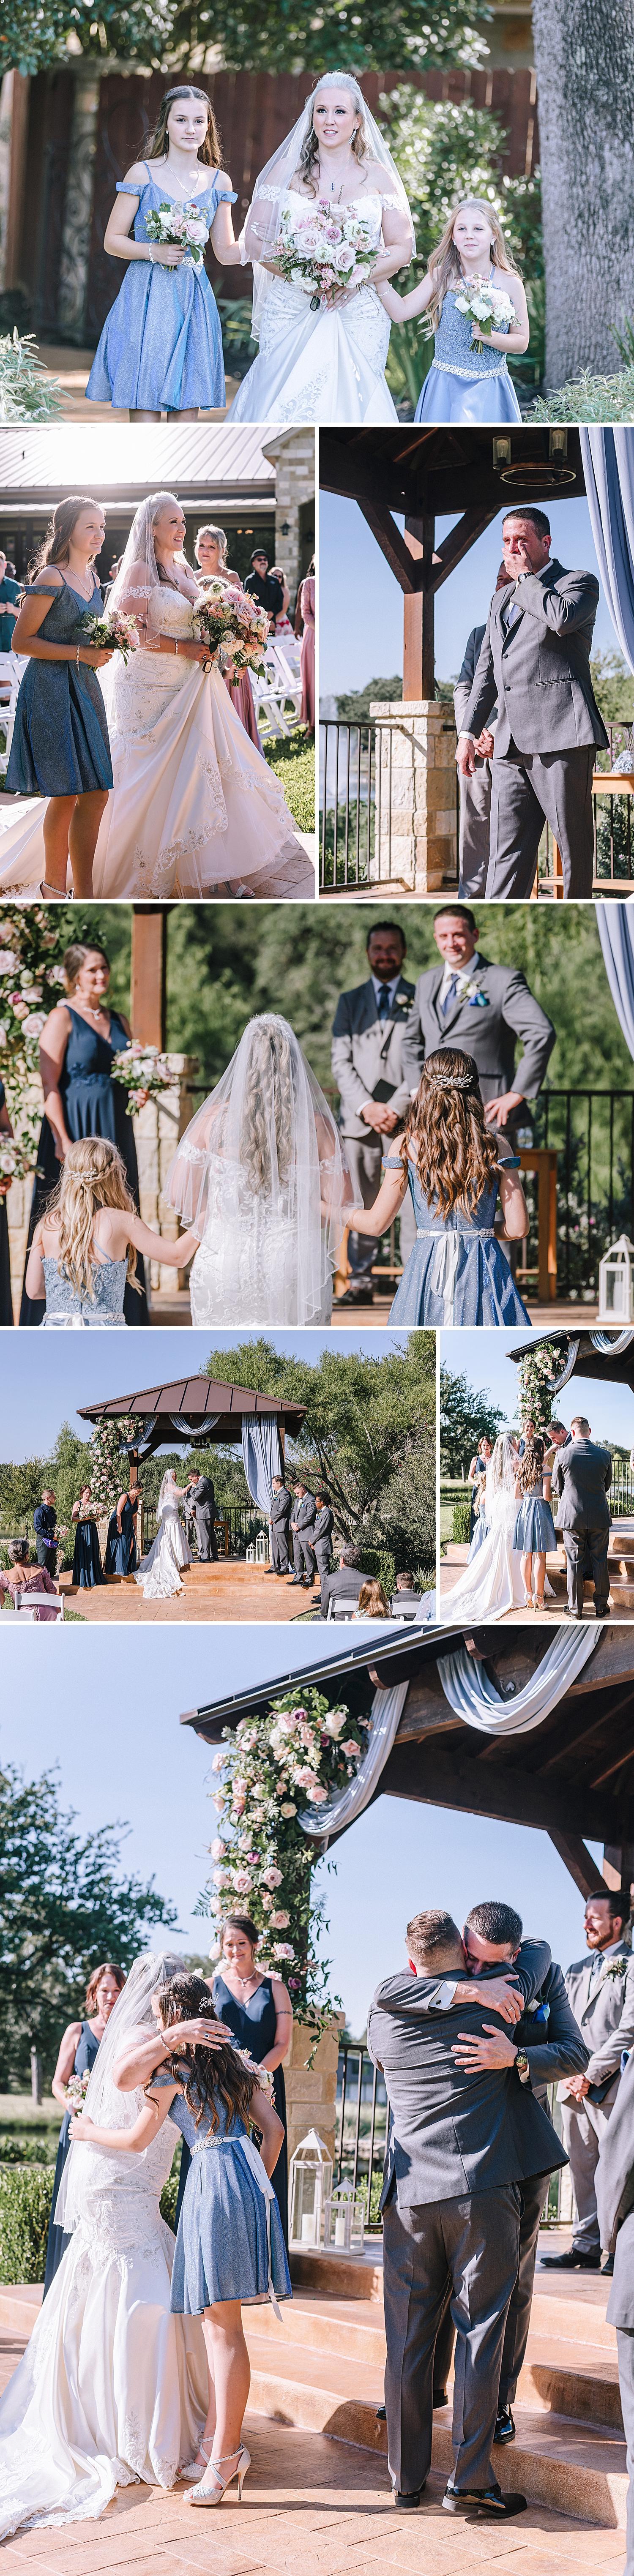 The-Club-at-Garden-Ridge-Military-Wedding-Carly-Barton-Photography_0064.jpg